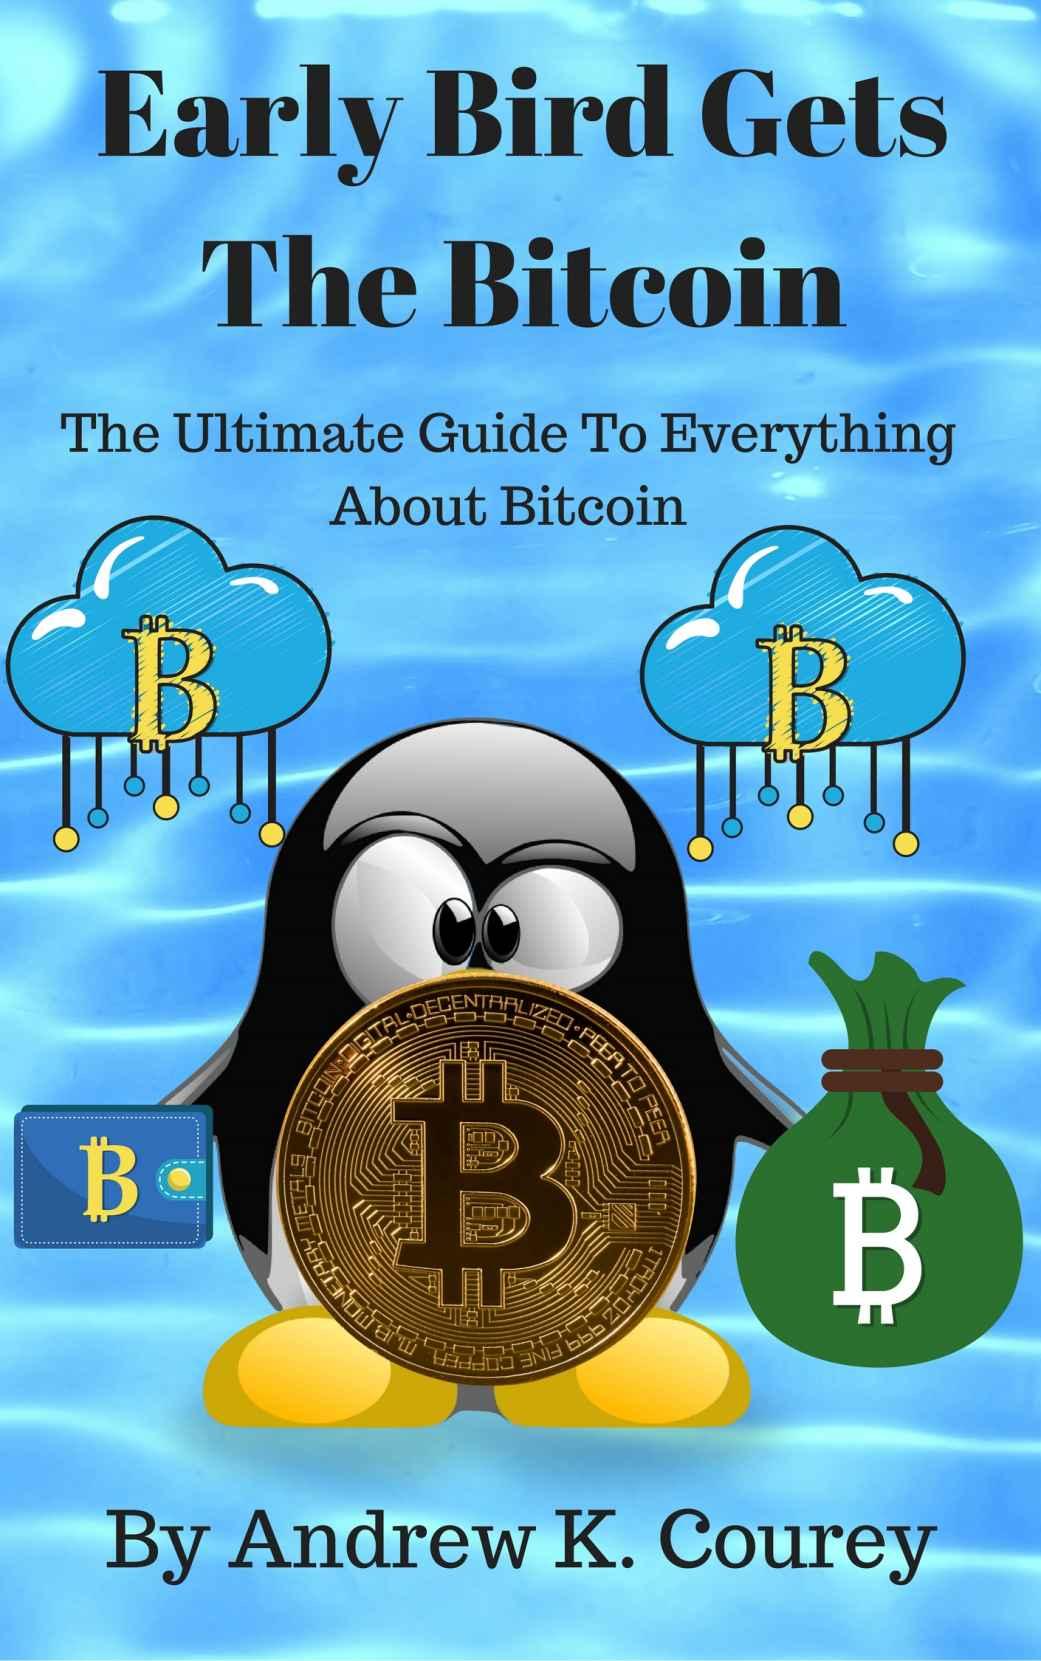 Early Bird Gets the Bitcoin!